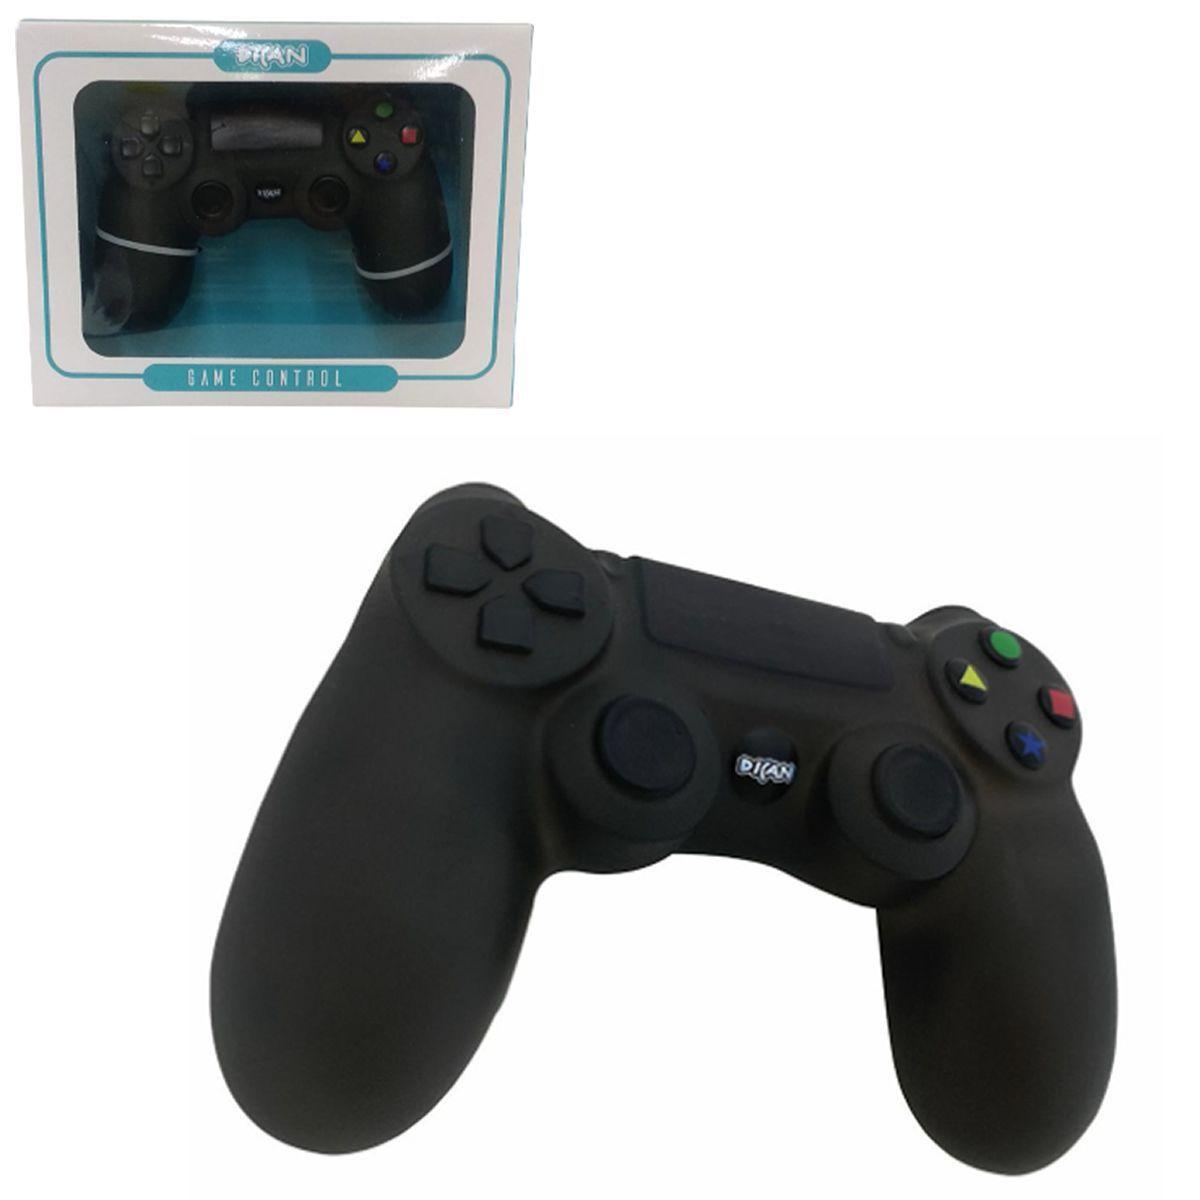 Mordedor Game Control - Dican